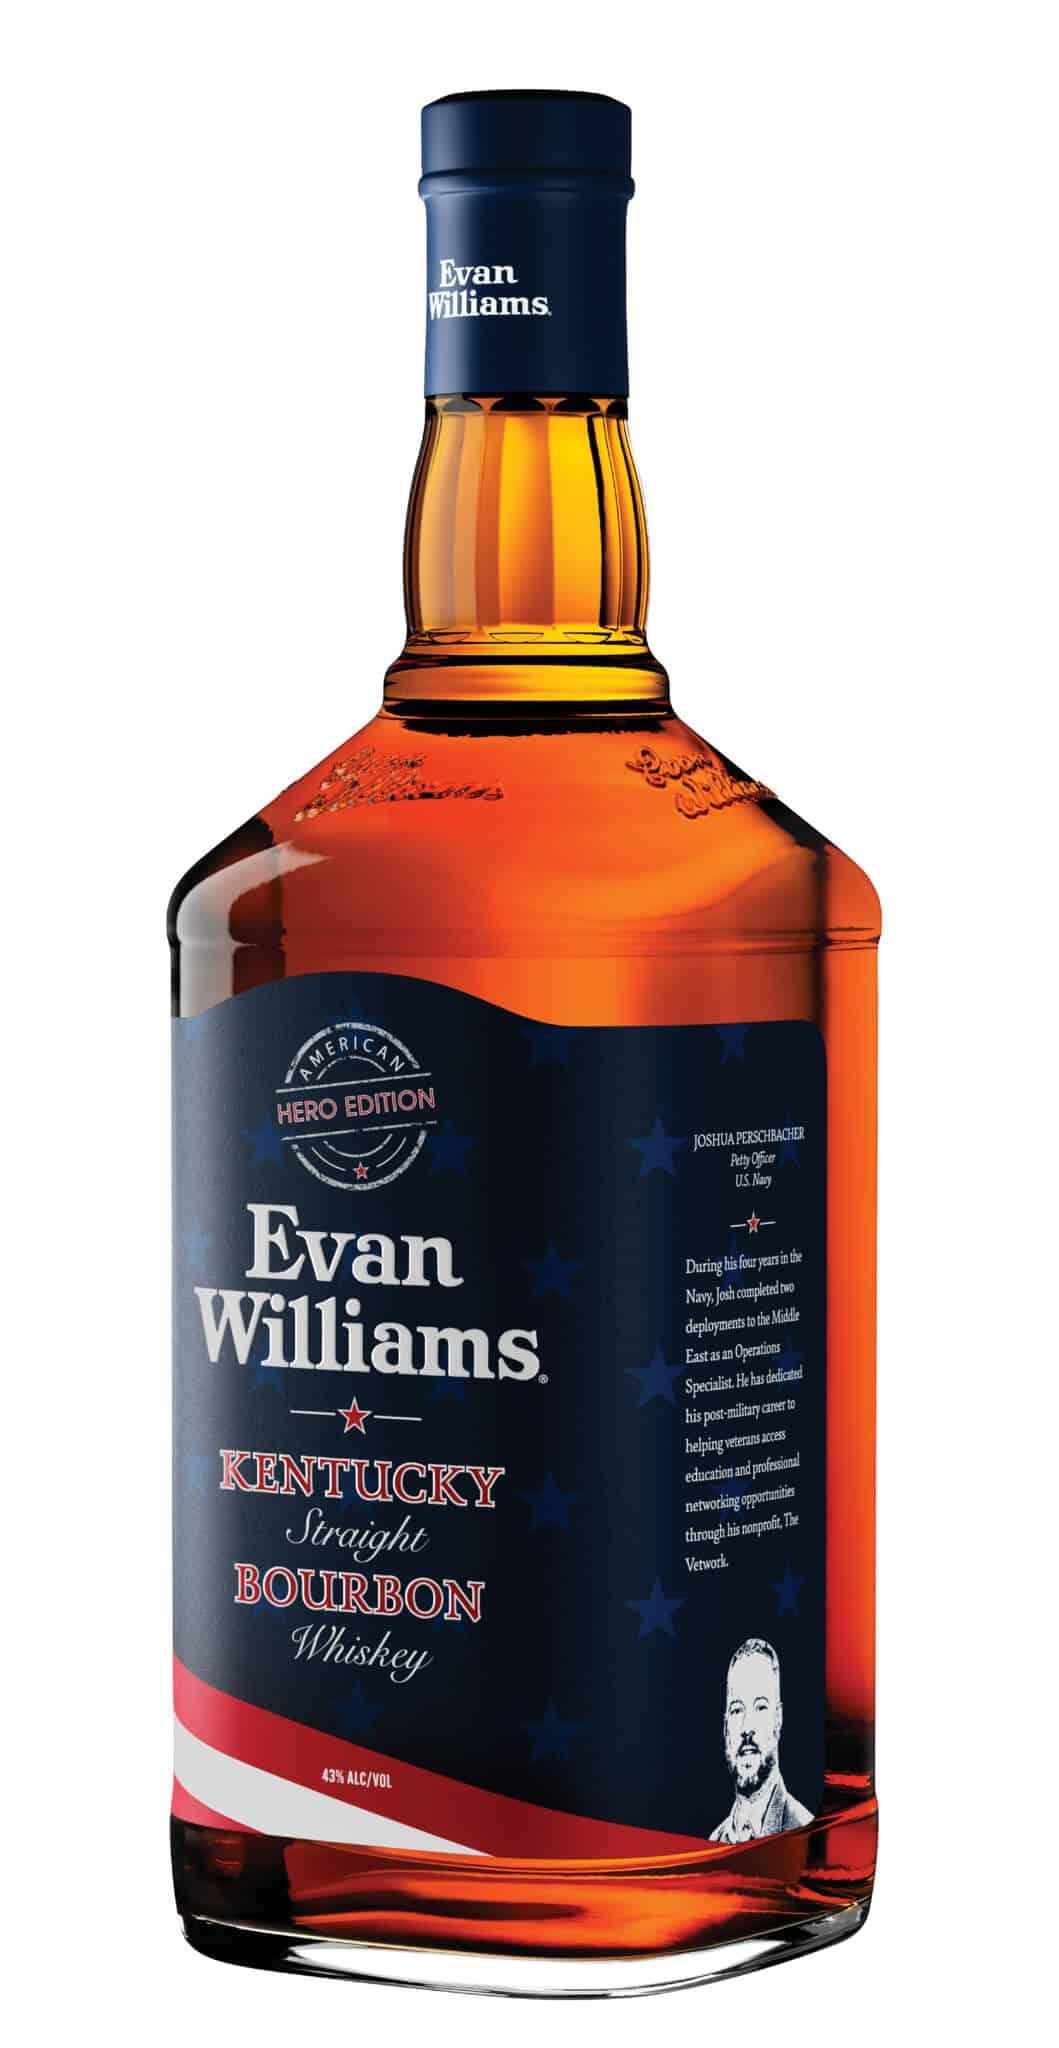 EWAMH LeftFacing 1.75L 2021 - Evan Williams Bourbon Announces 2021 American-Made Heroes